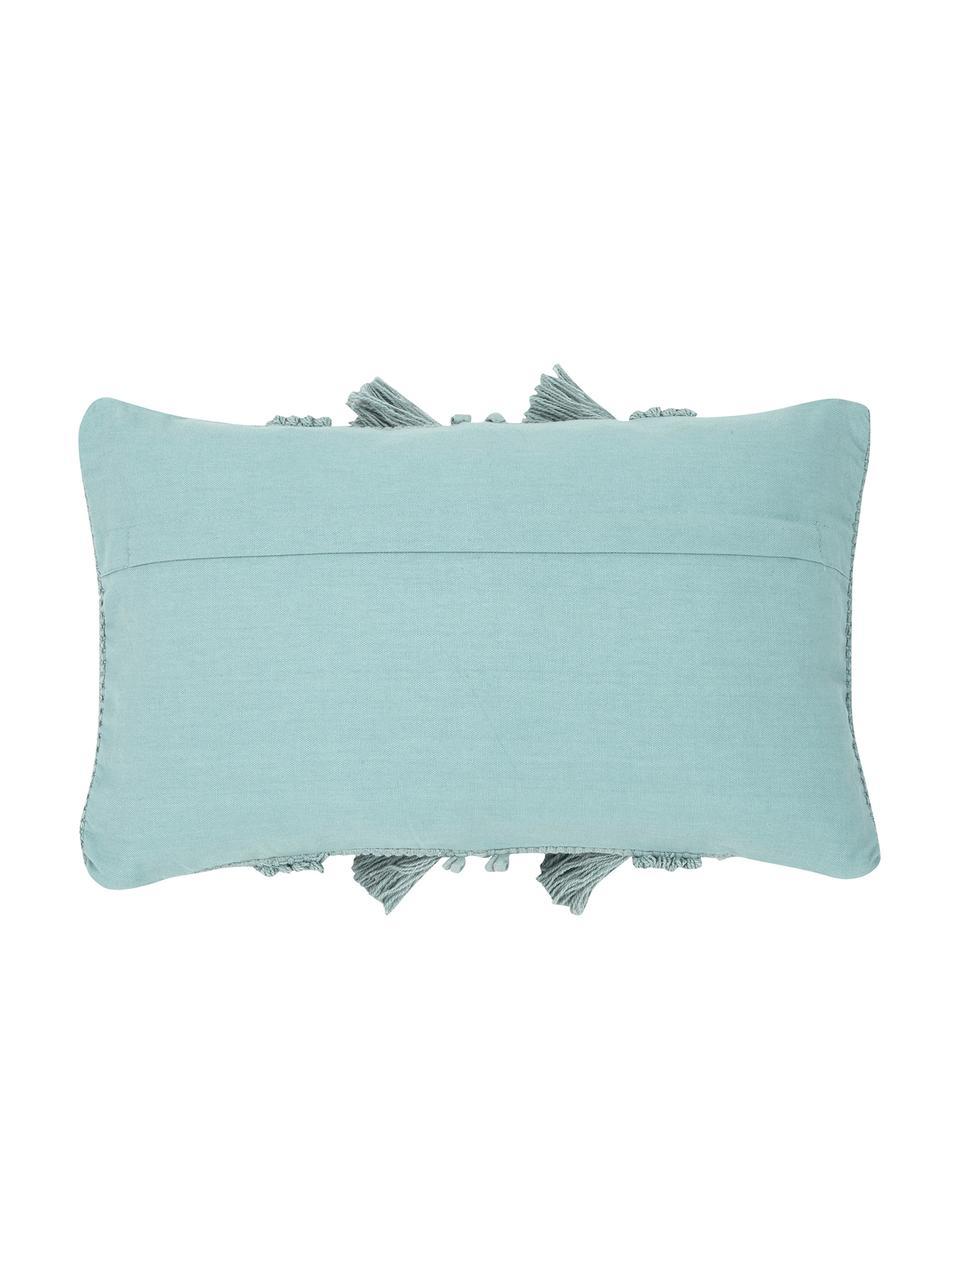 Federa arredo in cotone verde salvia Monika, 100% cotone, Verde salvia, Larg. 30 x Lung. 50 cm